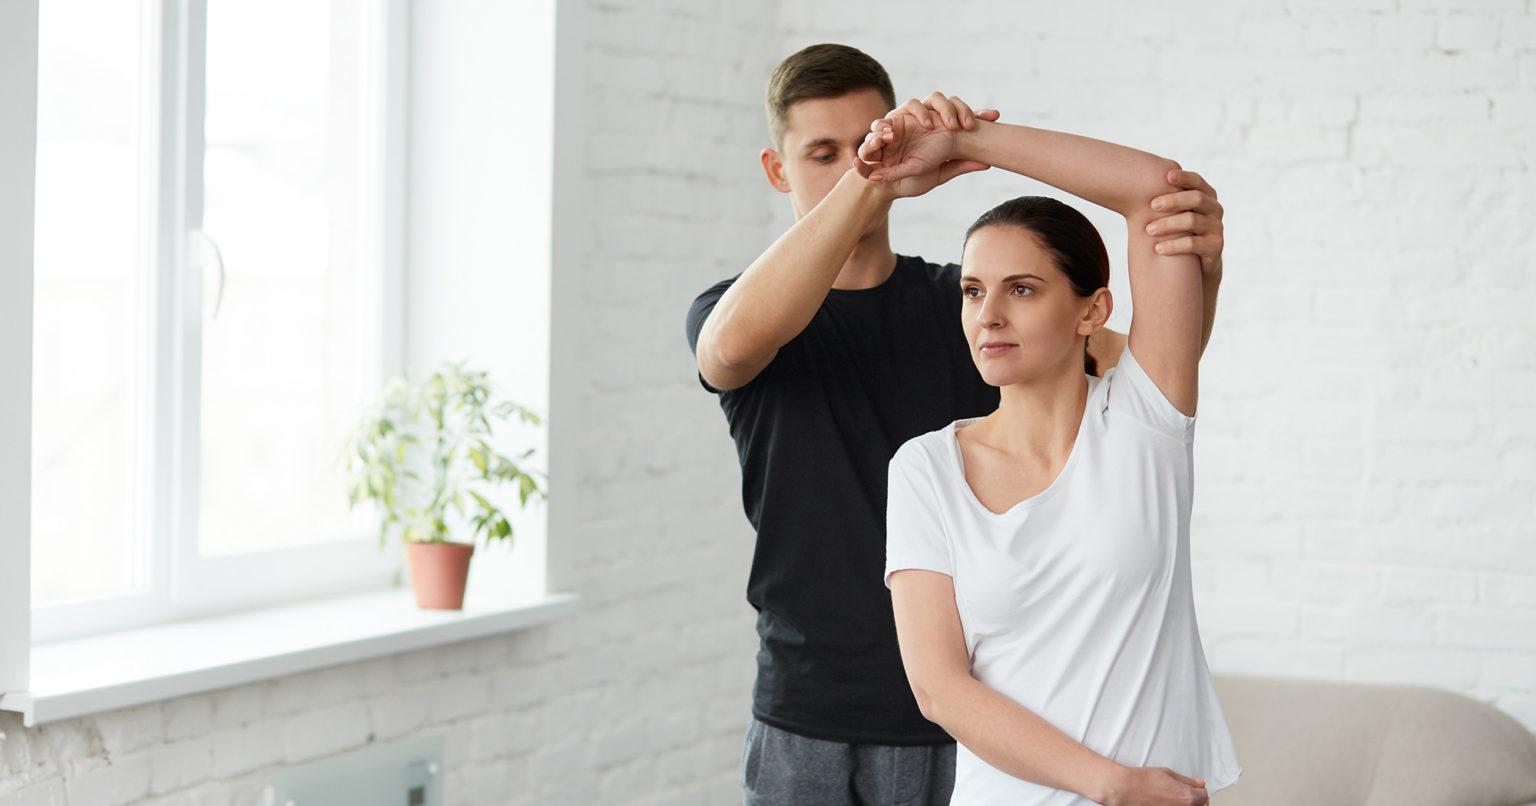 Fysioterapeut / Naprapat